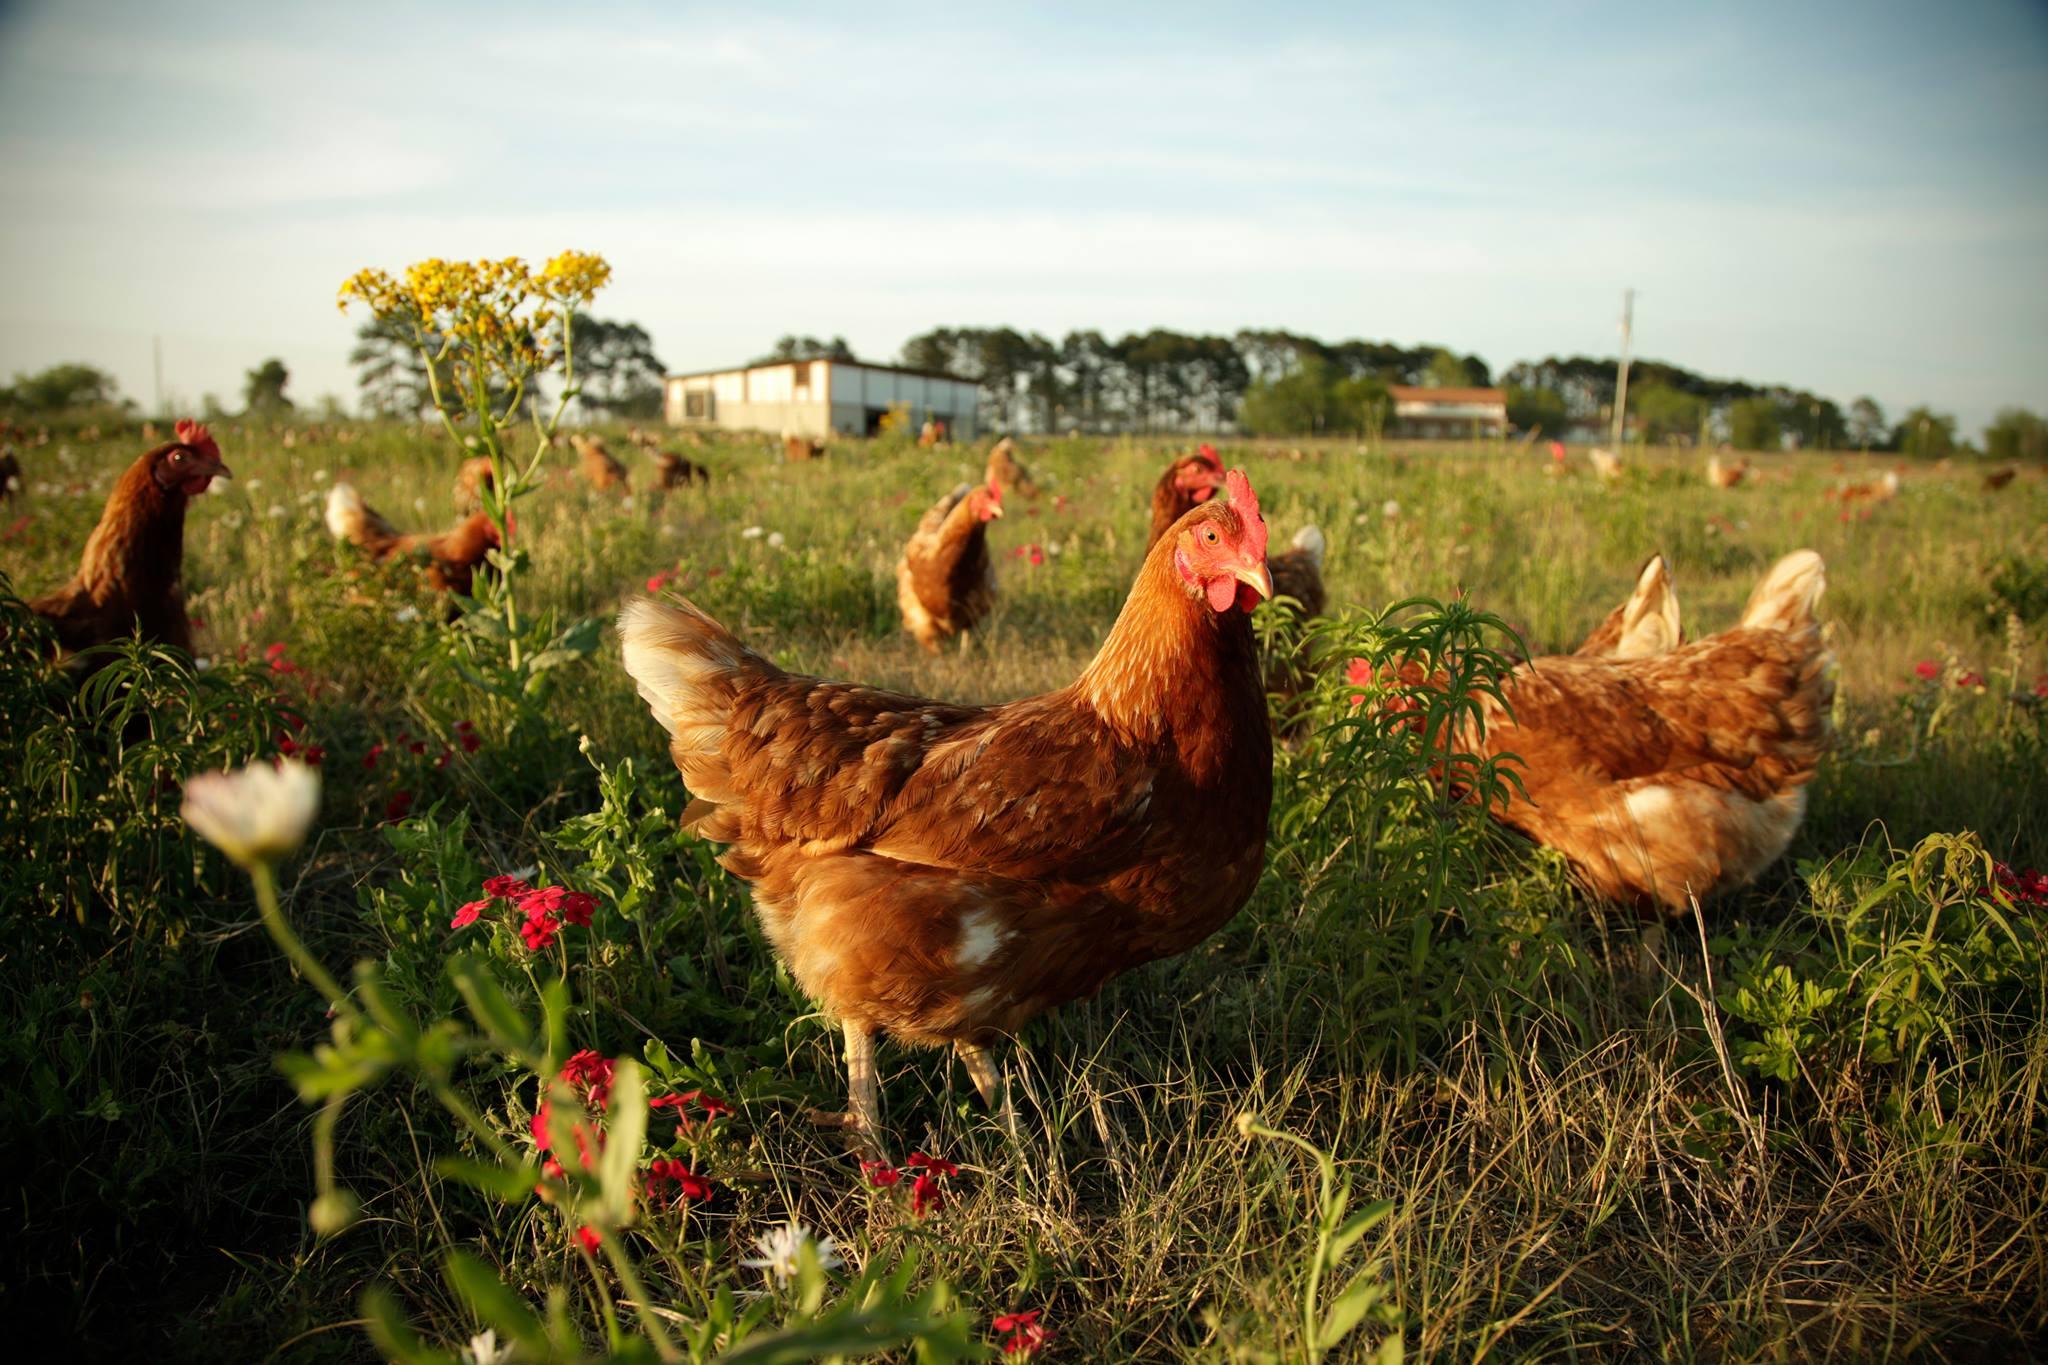 Happy chick farms 4.jpg